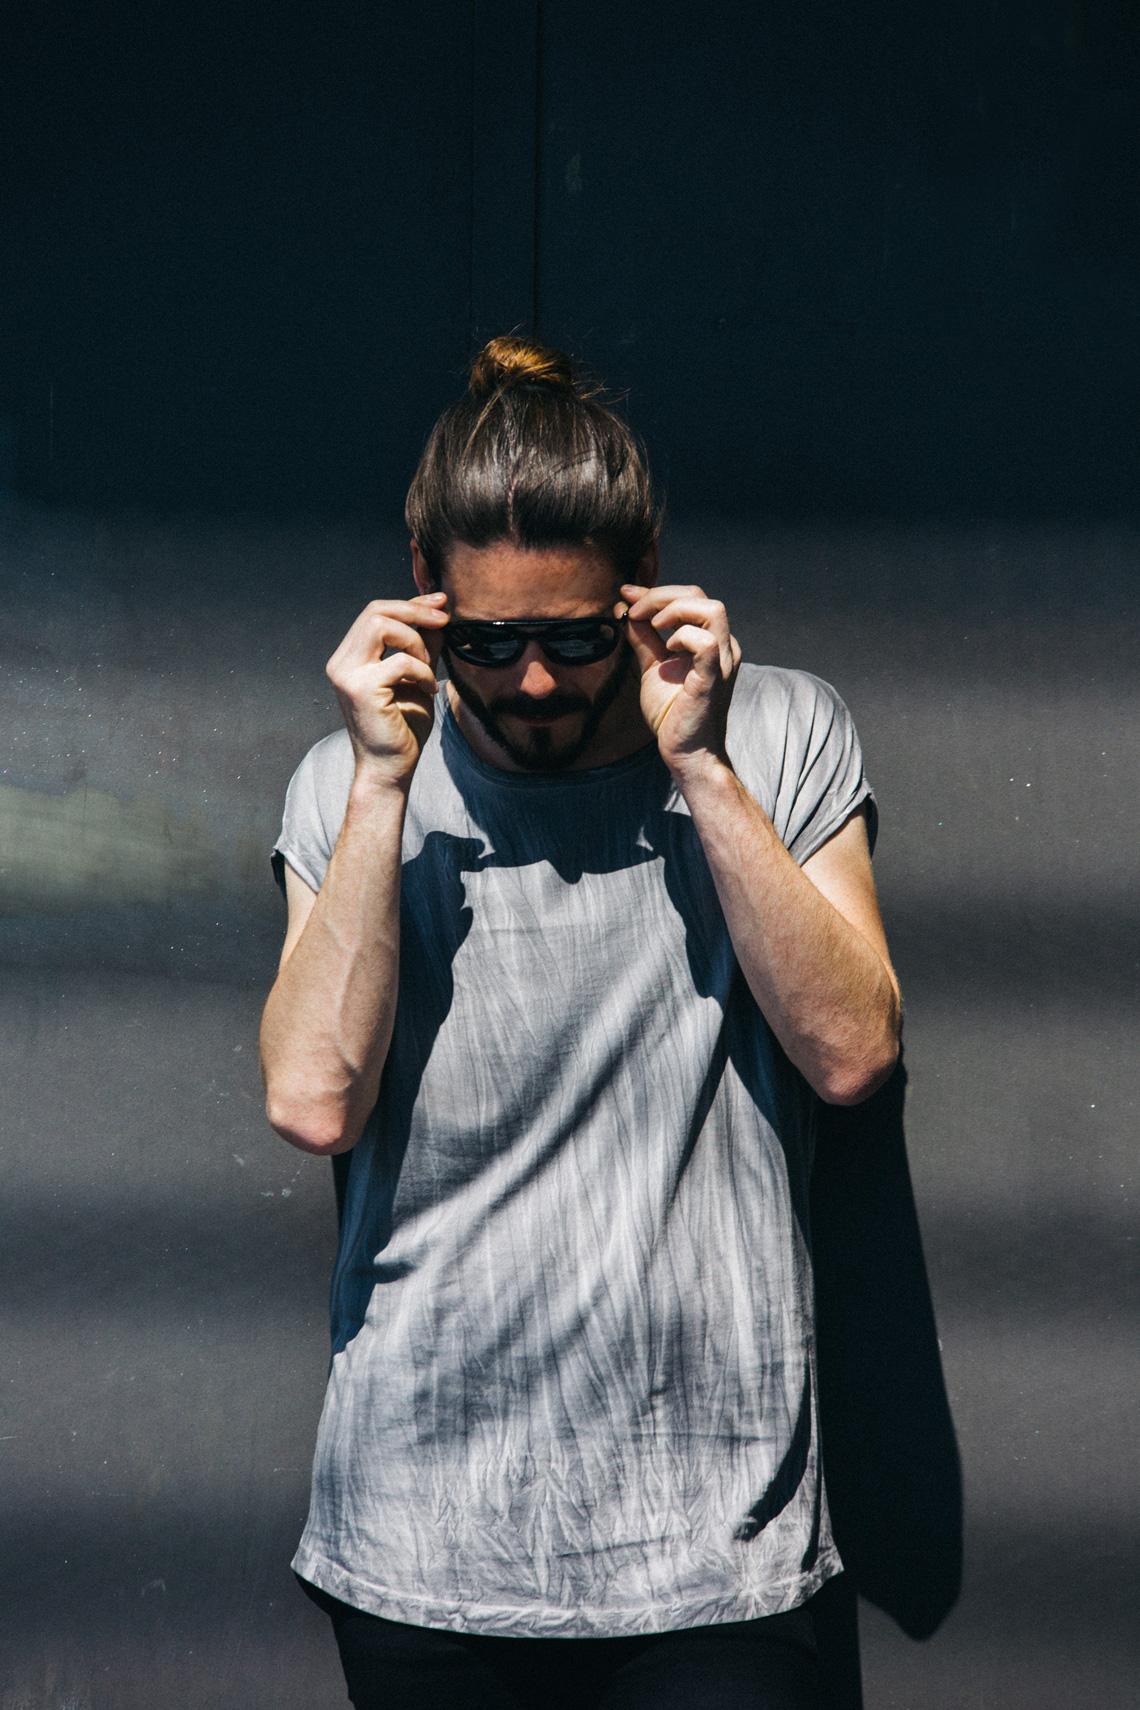 Kaisers-neue-kleider_Maennermodeblog_Male-Fashion-Style-Blog_Grunge-Outfit_Jeansshort_Docs_Fruehlingslook-Rockstar-Attitude_05